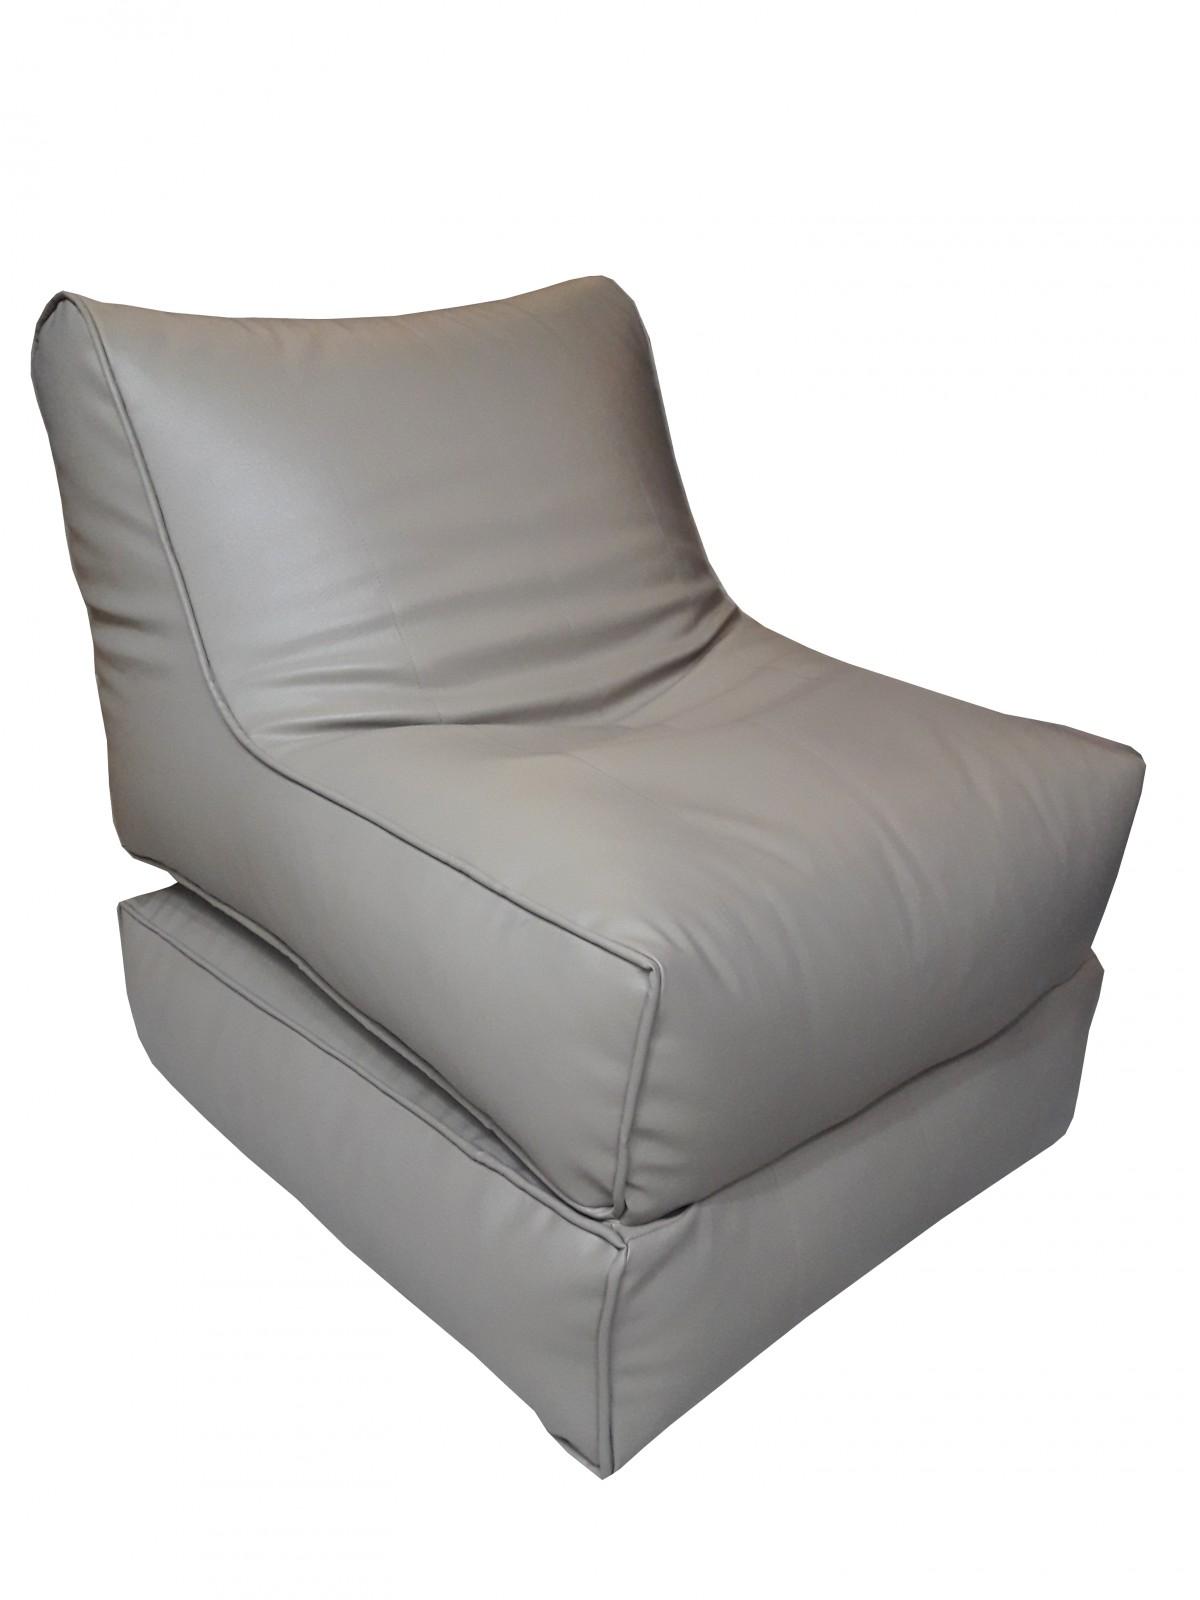 Cool Araish Khana Sofa Cum Bed Bean Bag Leatherite Medium Sacmbdle Ibusinesslaw Wood Chair Design Ideas Ibusinesslaworg